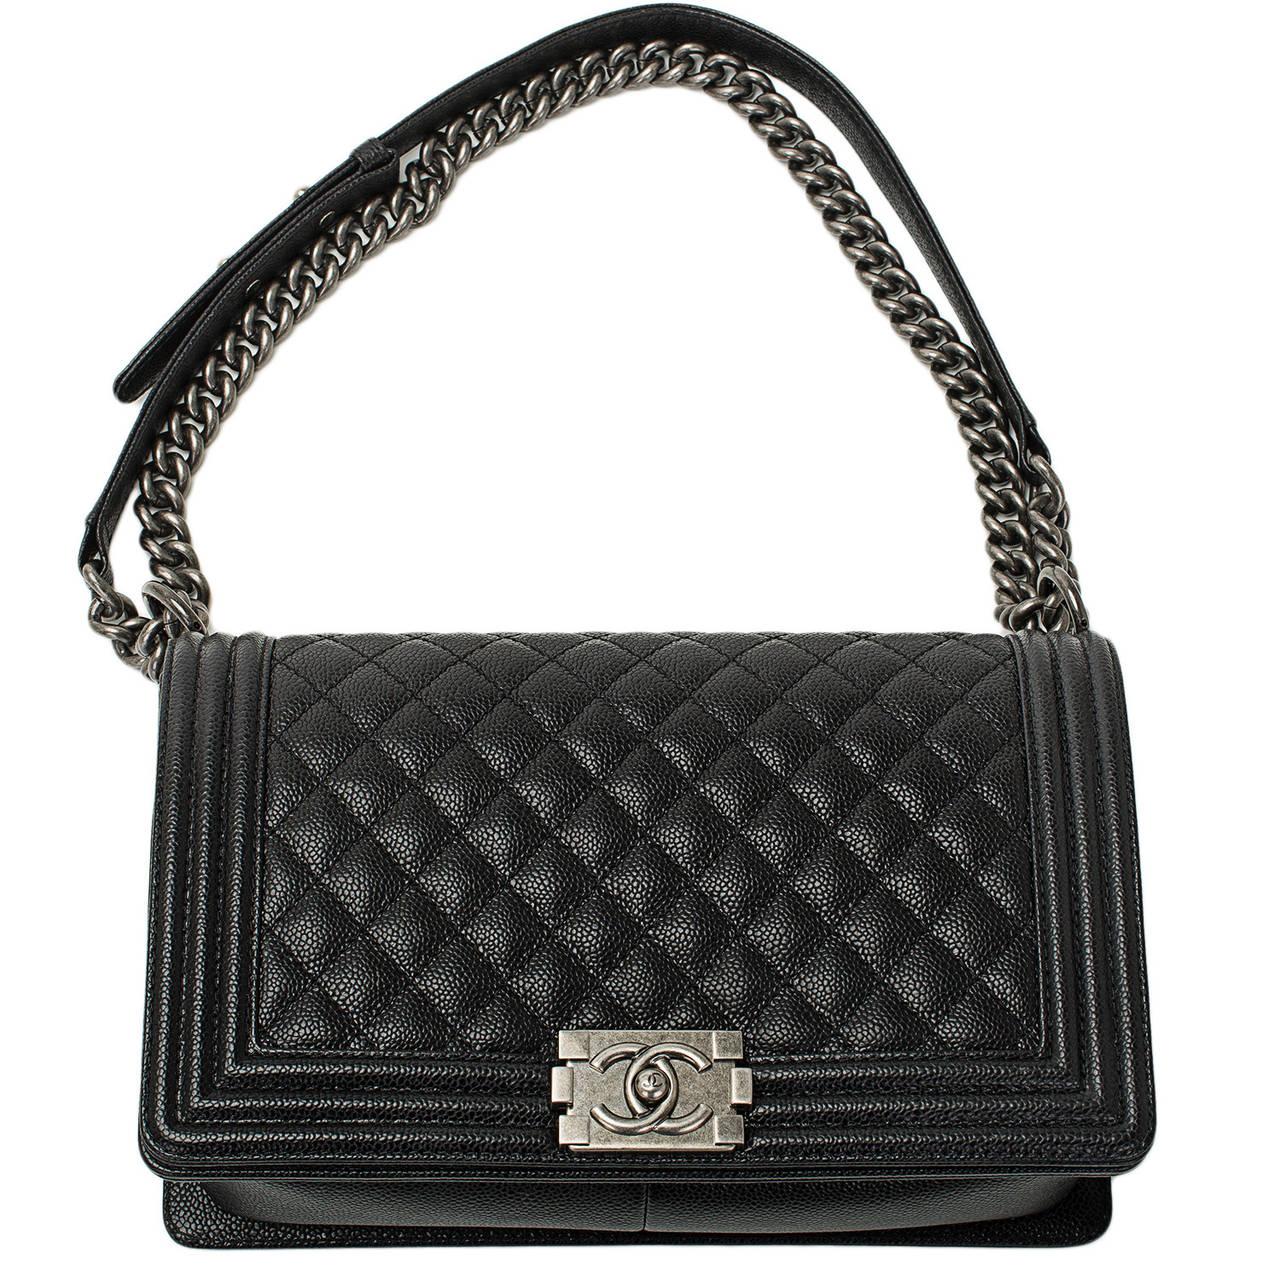 black leather Chanel caviar